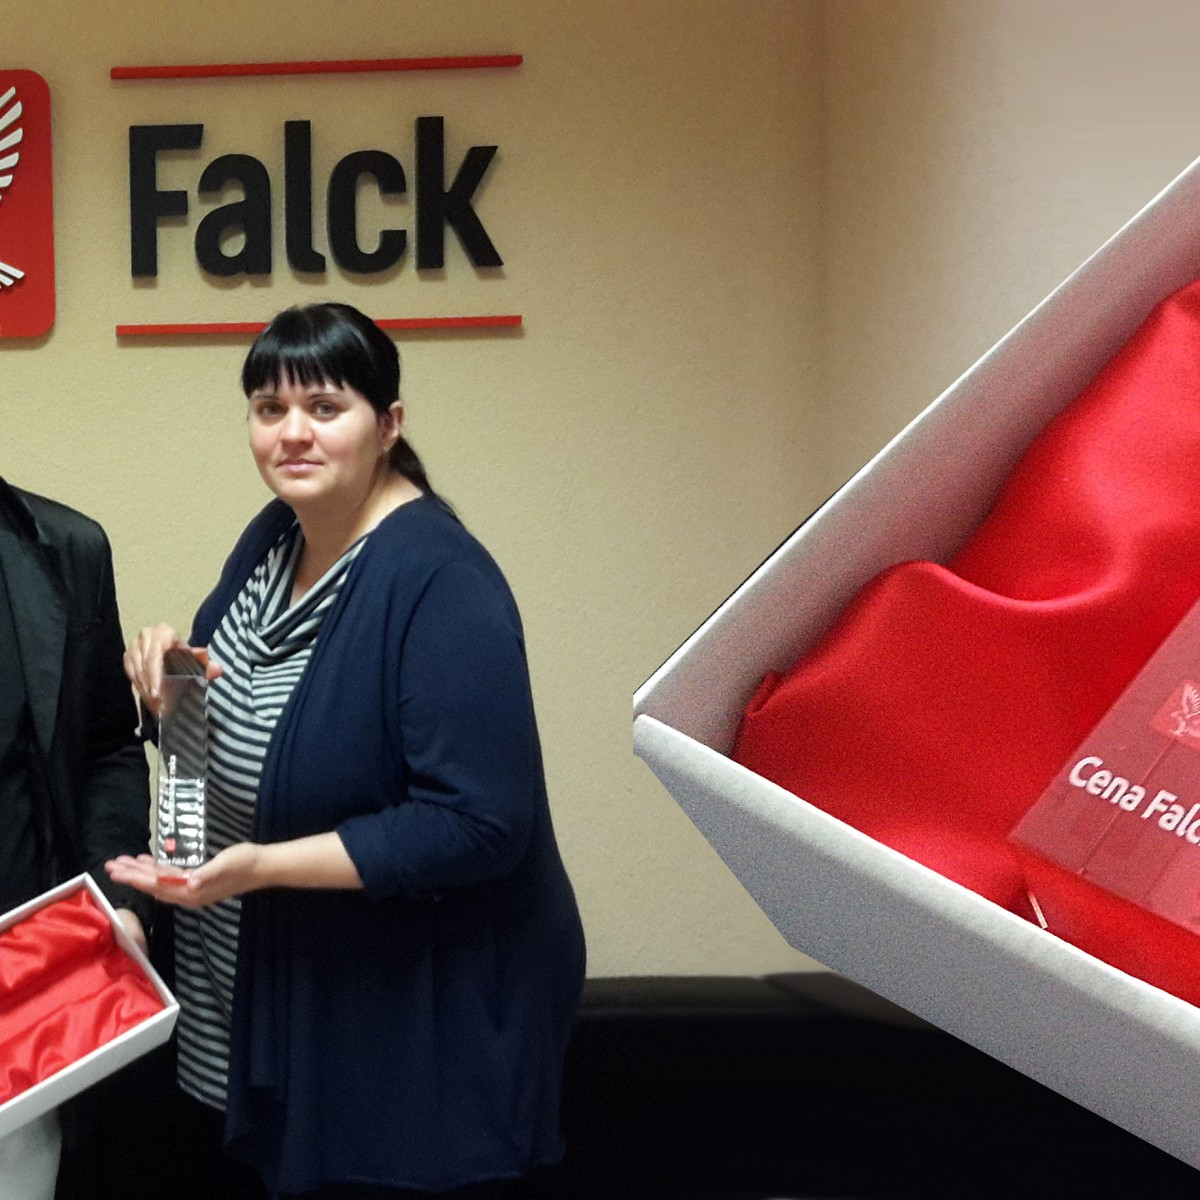 Ocenenia zo skla pre firmu Falck Emergency a.s.  bc8e0cfce80